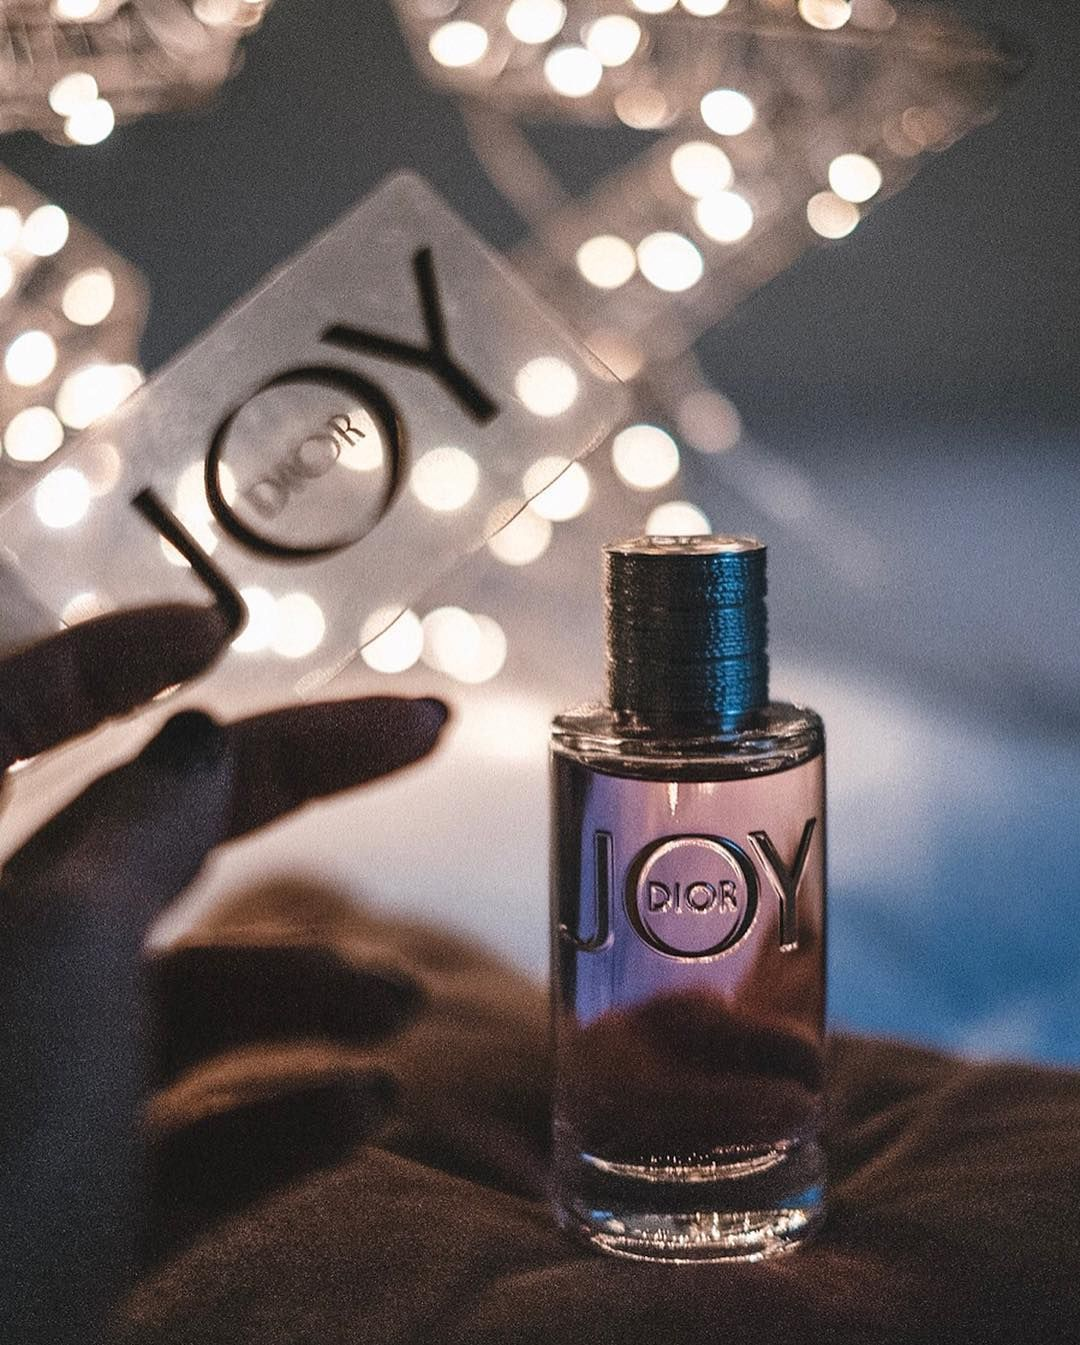 Joy Dior Joy Perfume Is The Perfect Summer Perfume Fragrance